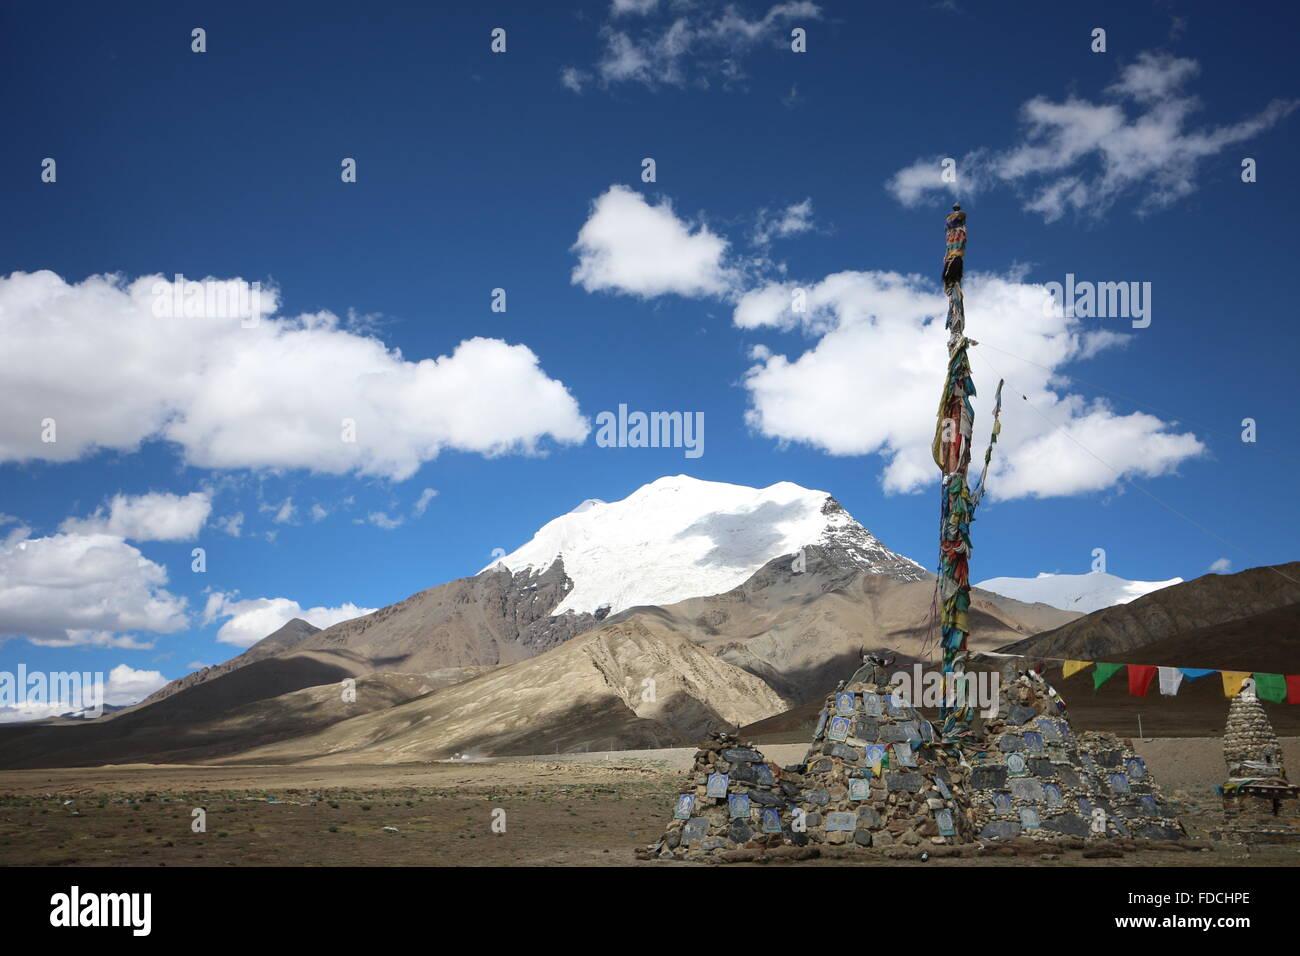 Snow Mountain in Tibet - Stock Image